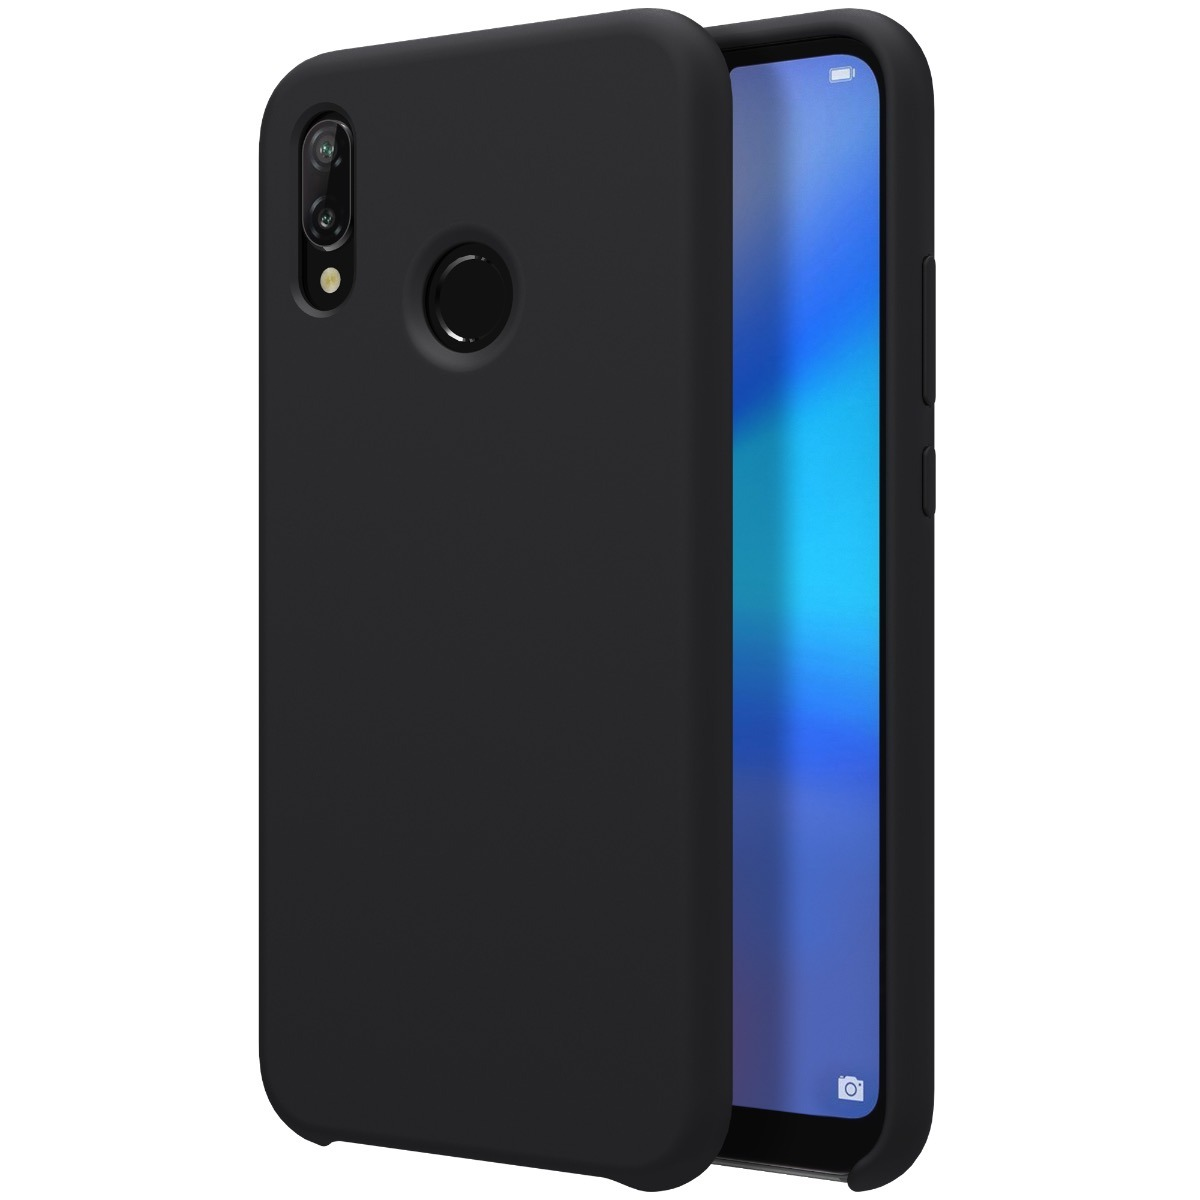 13e19afee63 Funda Huawei P20 Lite - Nillkin Flex Pure Case - $ 299.00 en Mercado ...